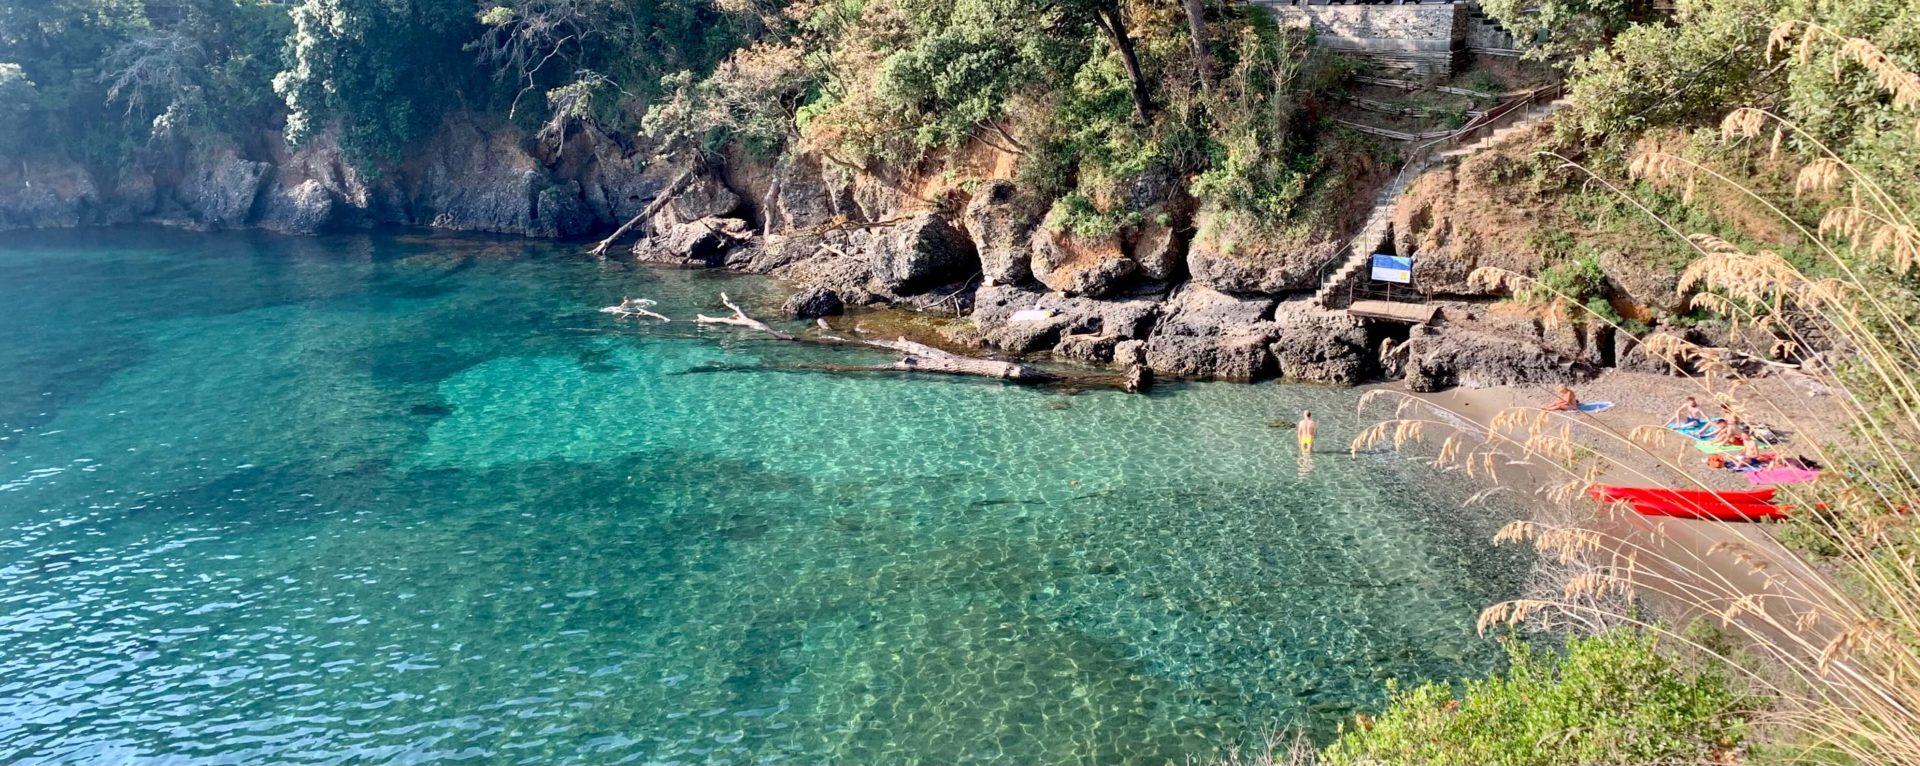 baia di niasca dove ha sede outdoor portofino